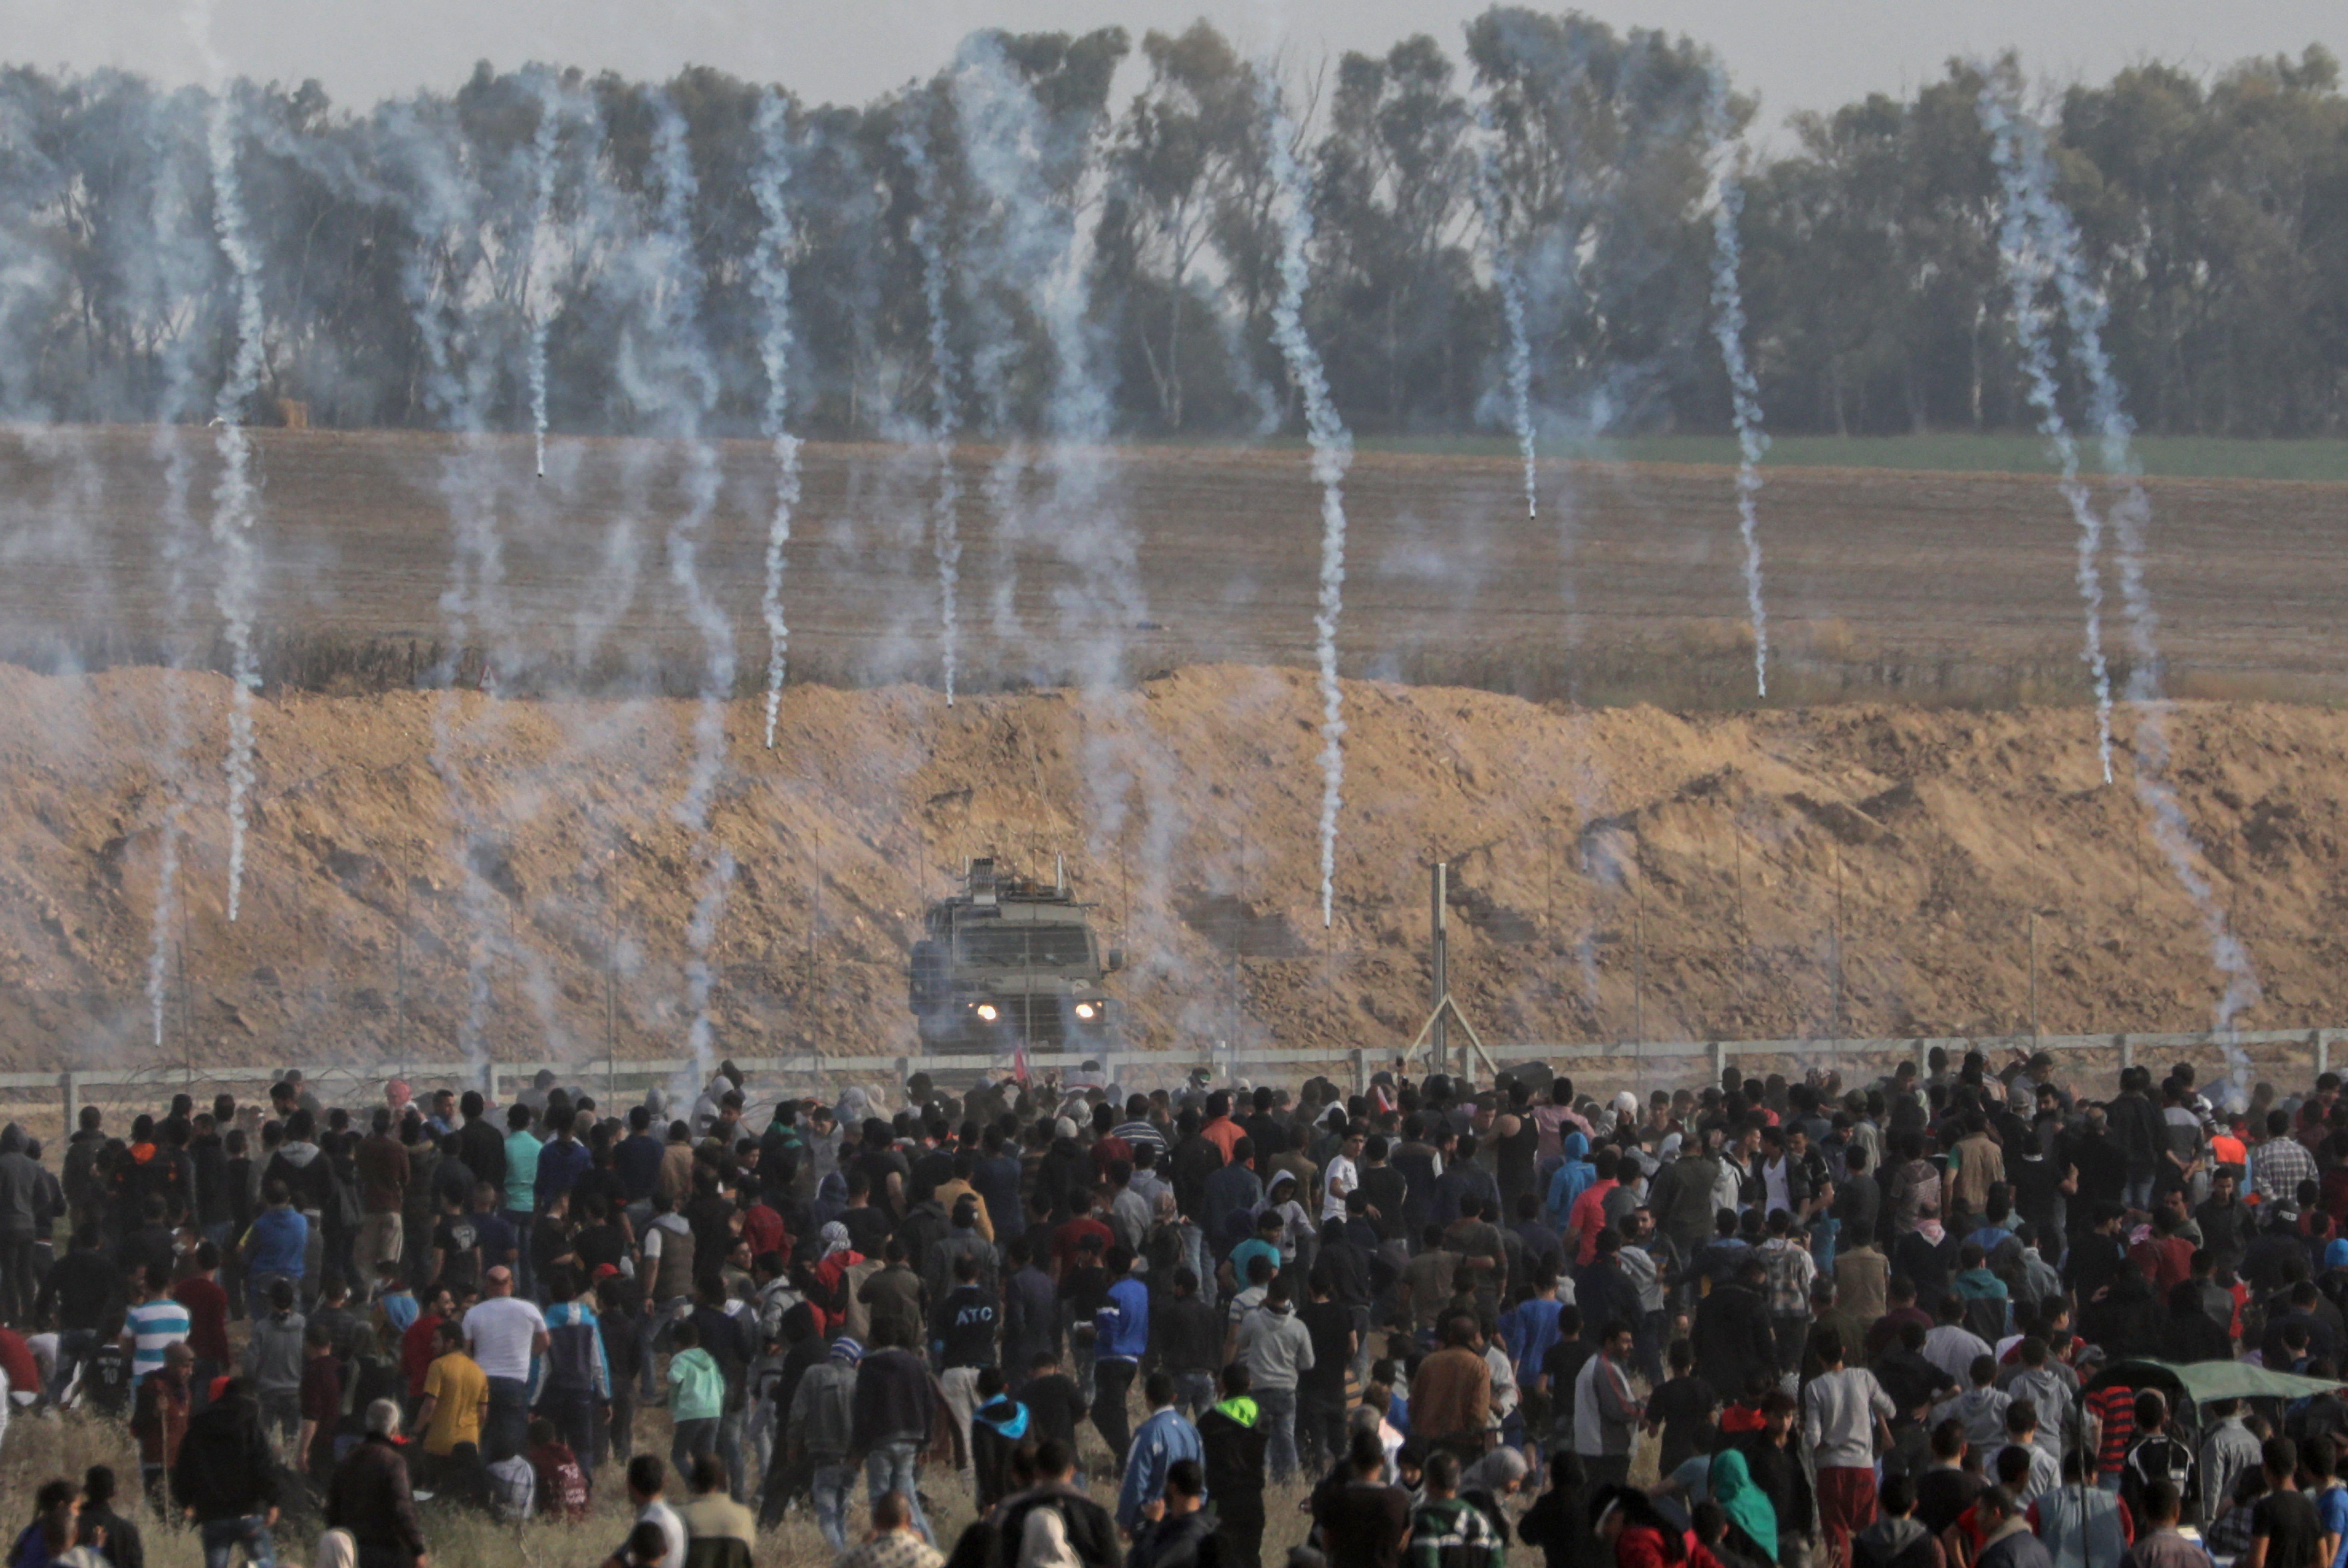 Why is Israel shooting at Palestinian demonstrators in Gaza?